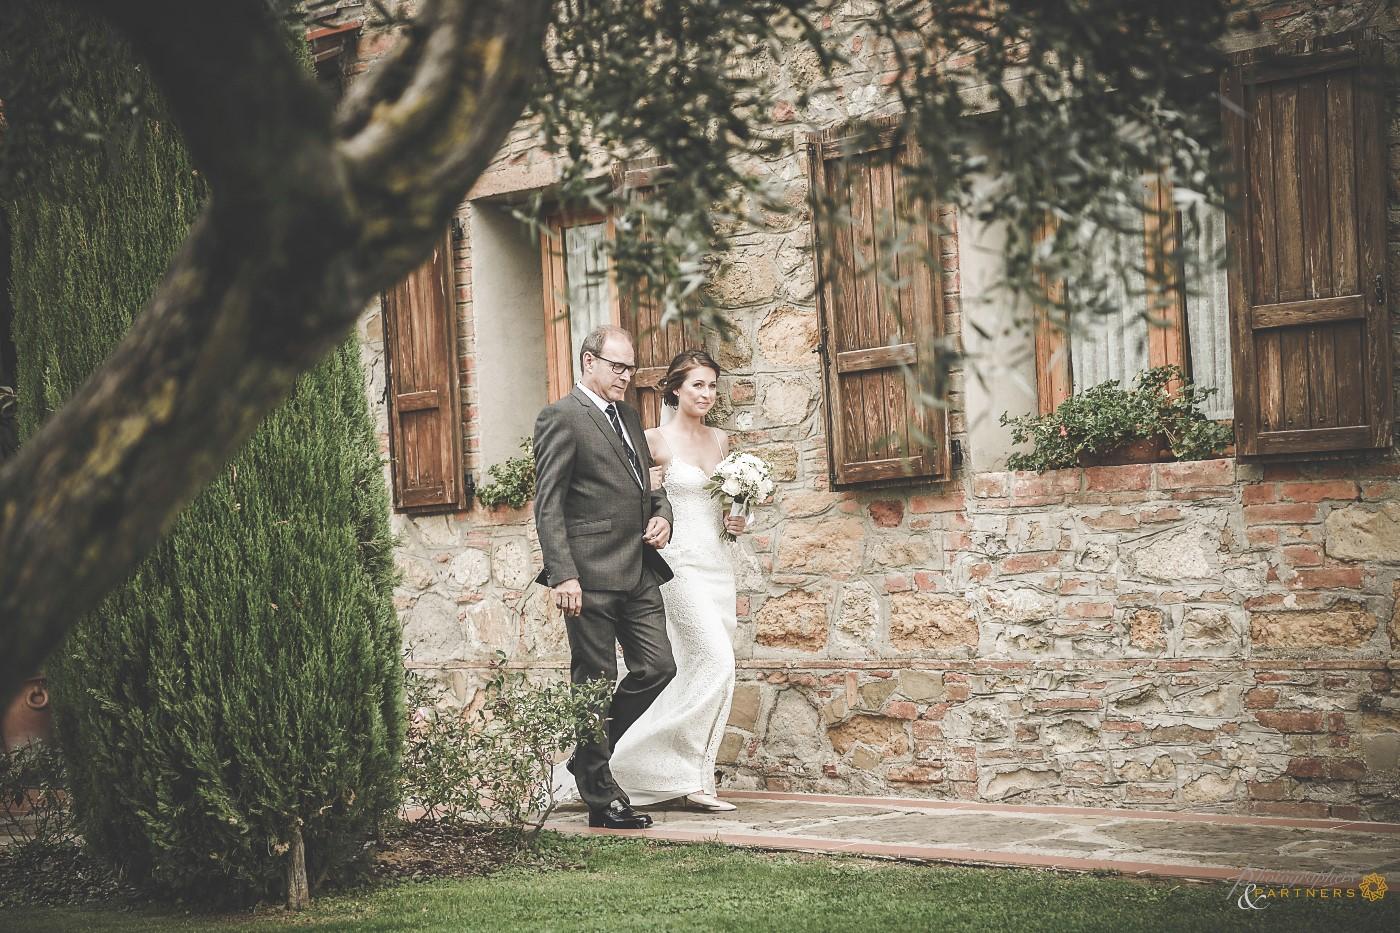 wedding_photos_tenuta_quadrifoglio_05.jpg